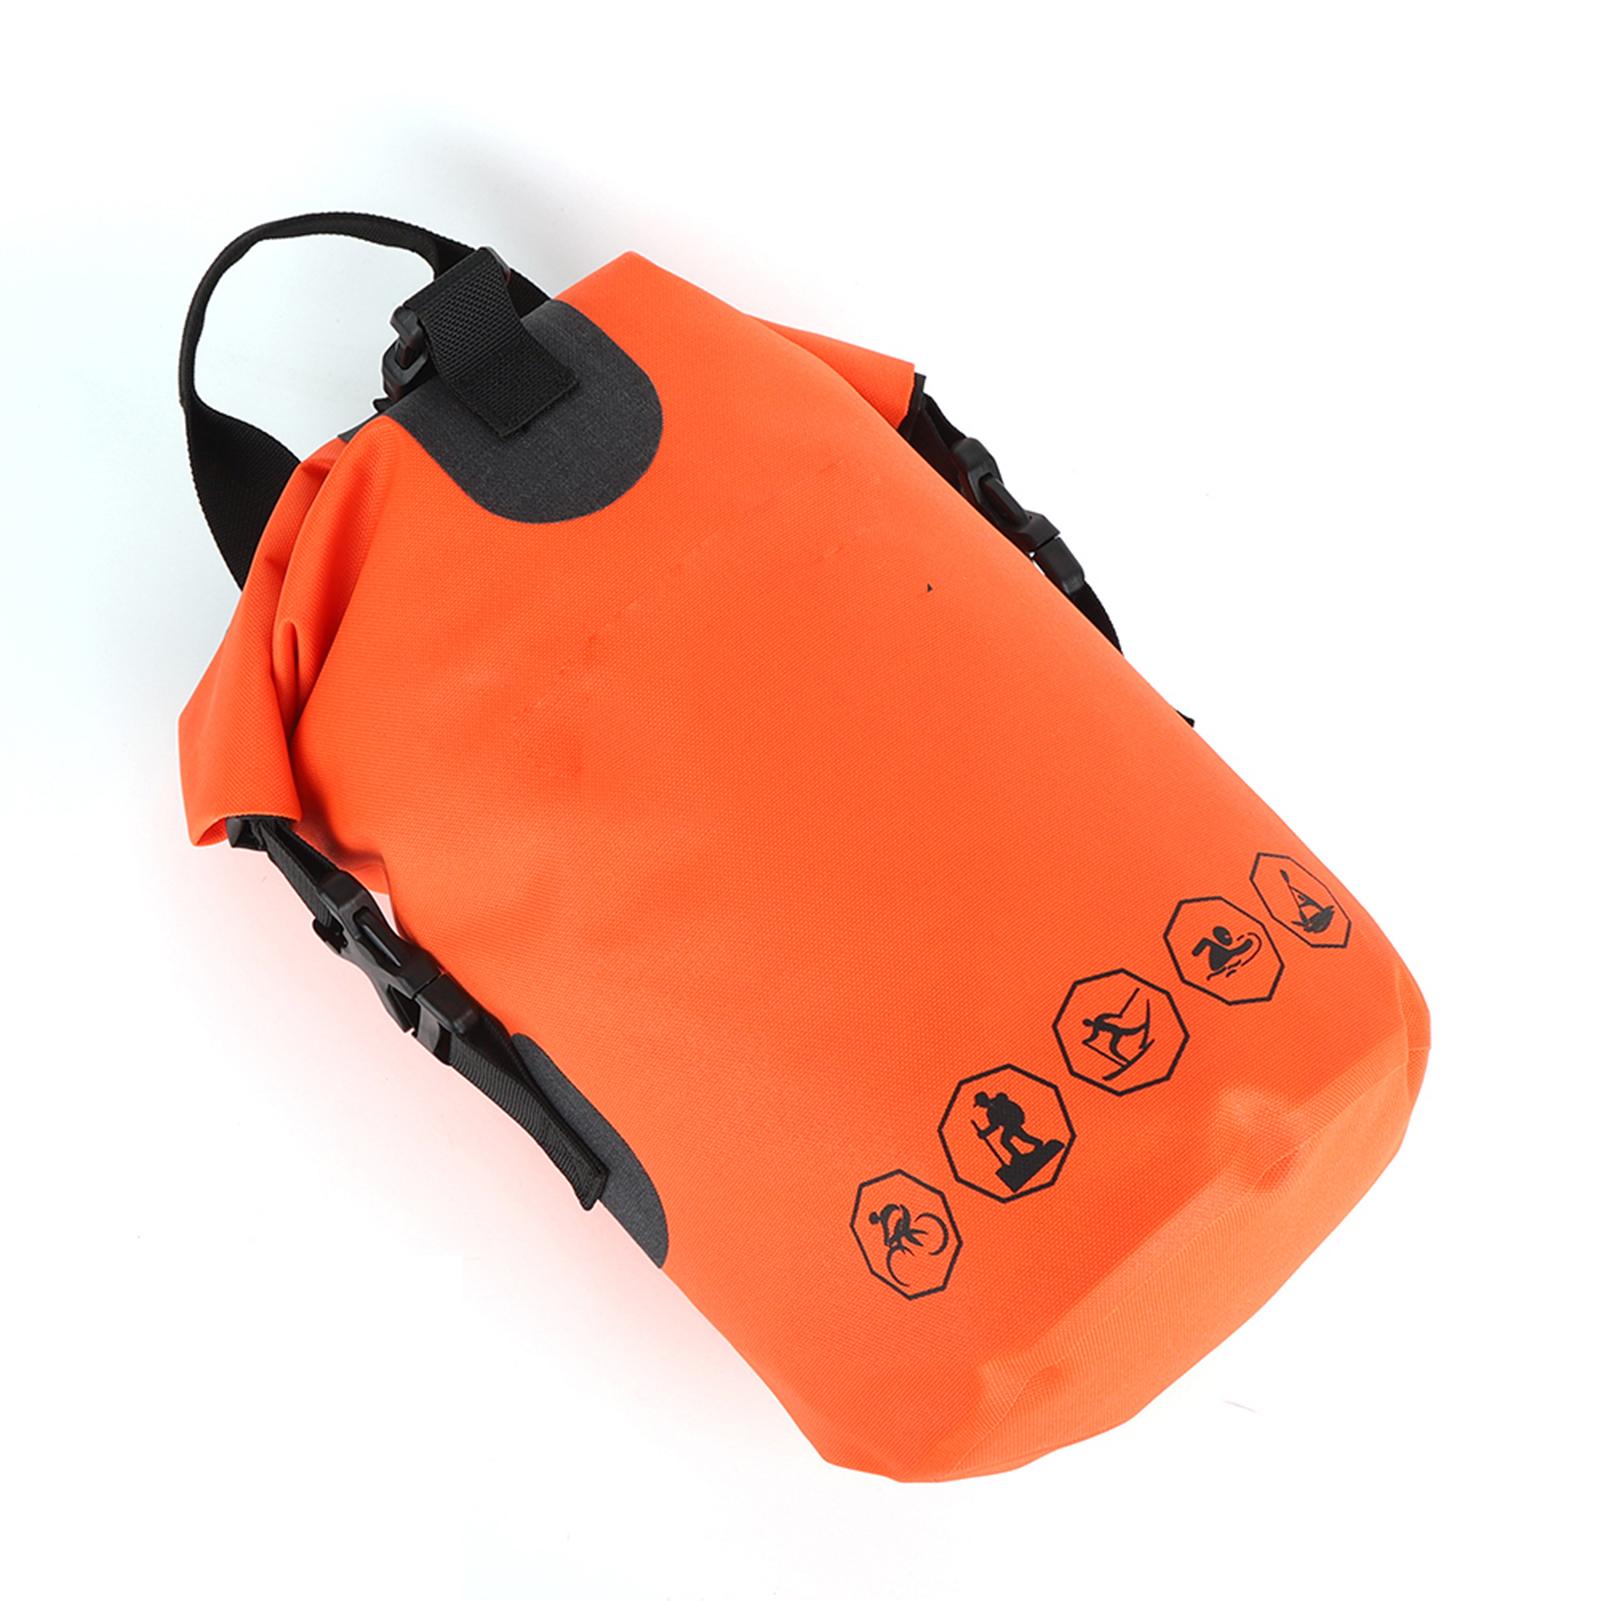 Heavy-Duty-Waterproof-Dry-Bag-10L-Storage-Pack-Summer-Outdoor-Sport-Beach-Bag-DD thumbnail 11